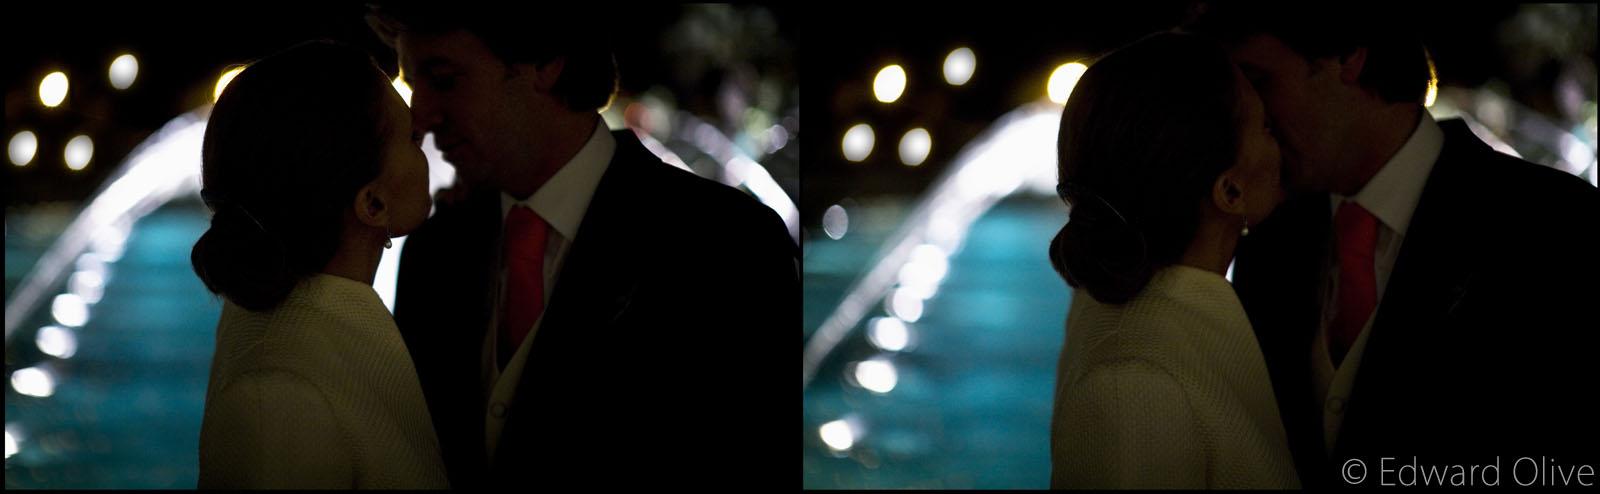 Los Novios - Copyright Edward Olive fotografos de bodas Eivissa Wedding photographer Ibiza Spain Europe